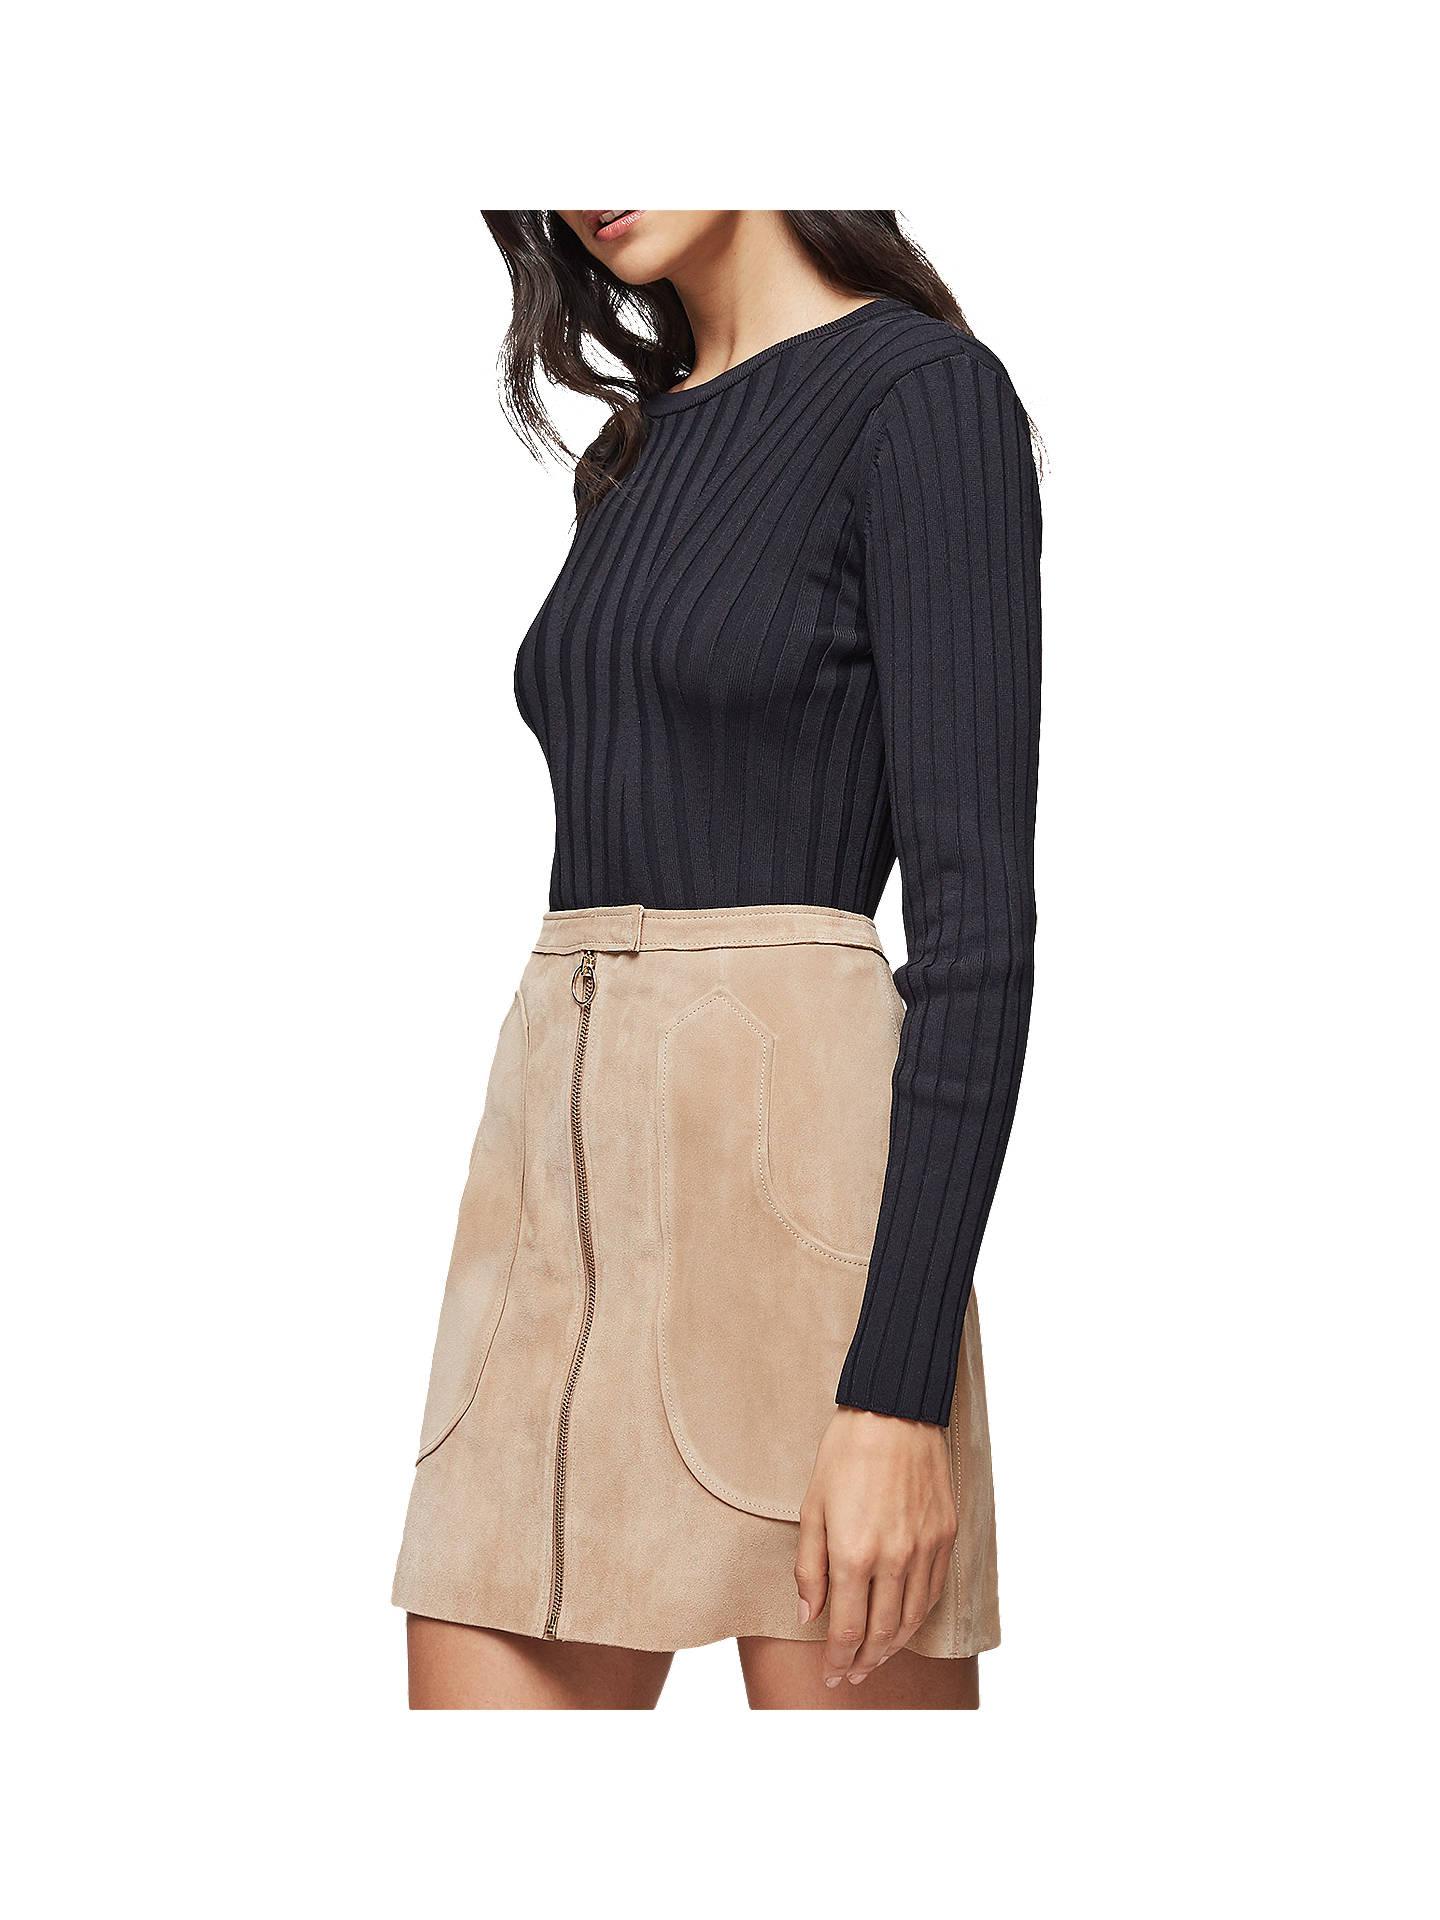 3a1feccec0 ... Buy Reiss Keaton Suede Mini Skirt, Sand, 6 Online at johnlewis.com